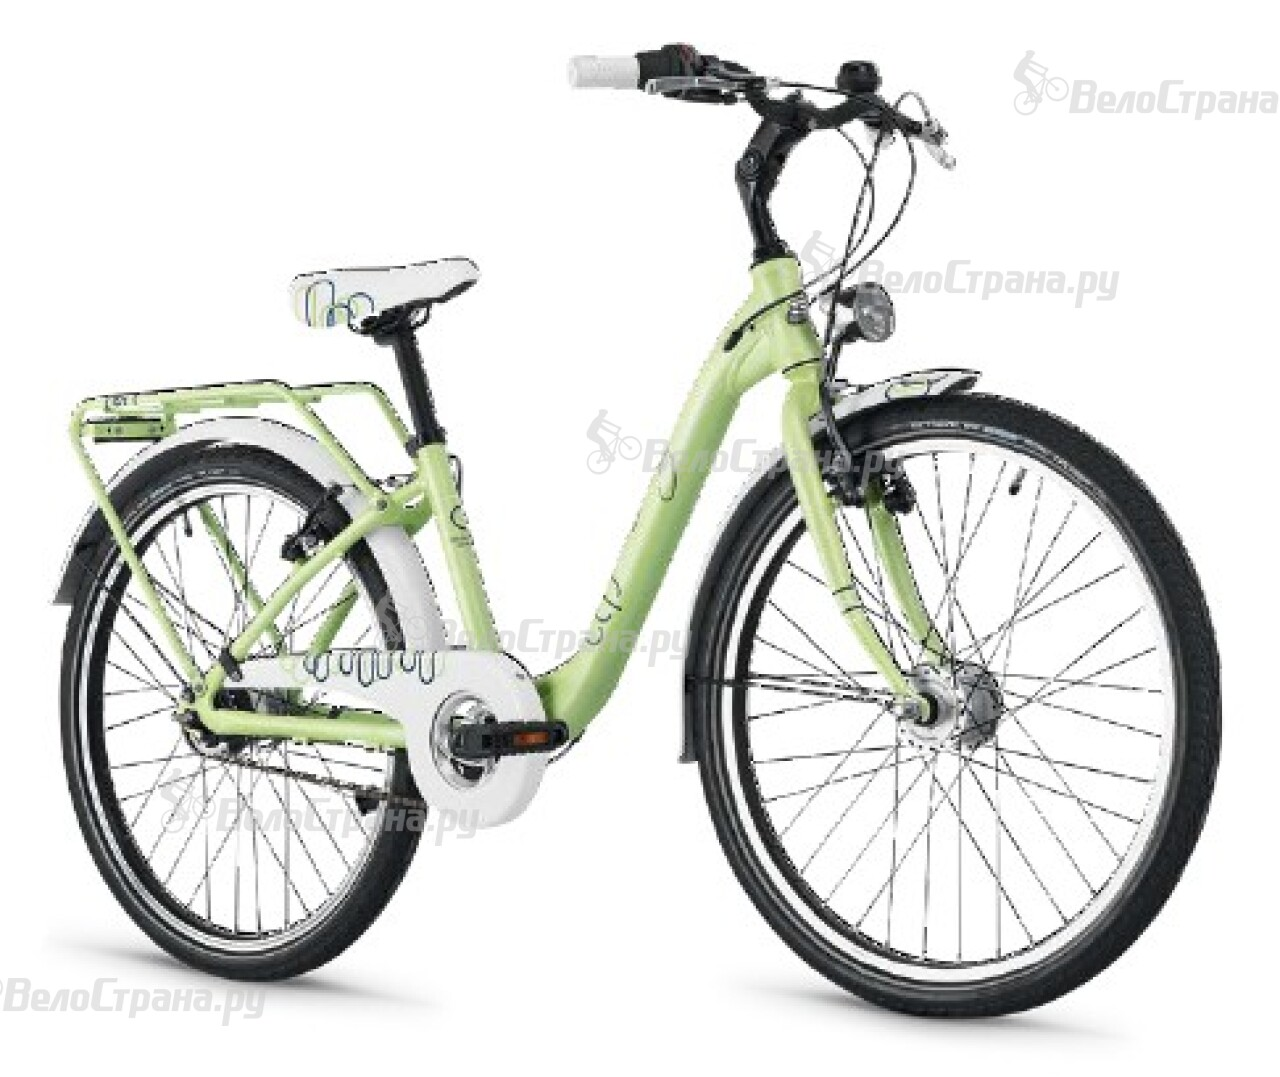 Велосипед Scool ChiX 24 7S (2014) nikon prostaff 7s 8x42